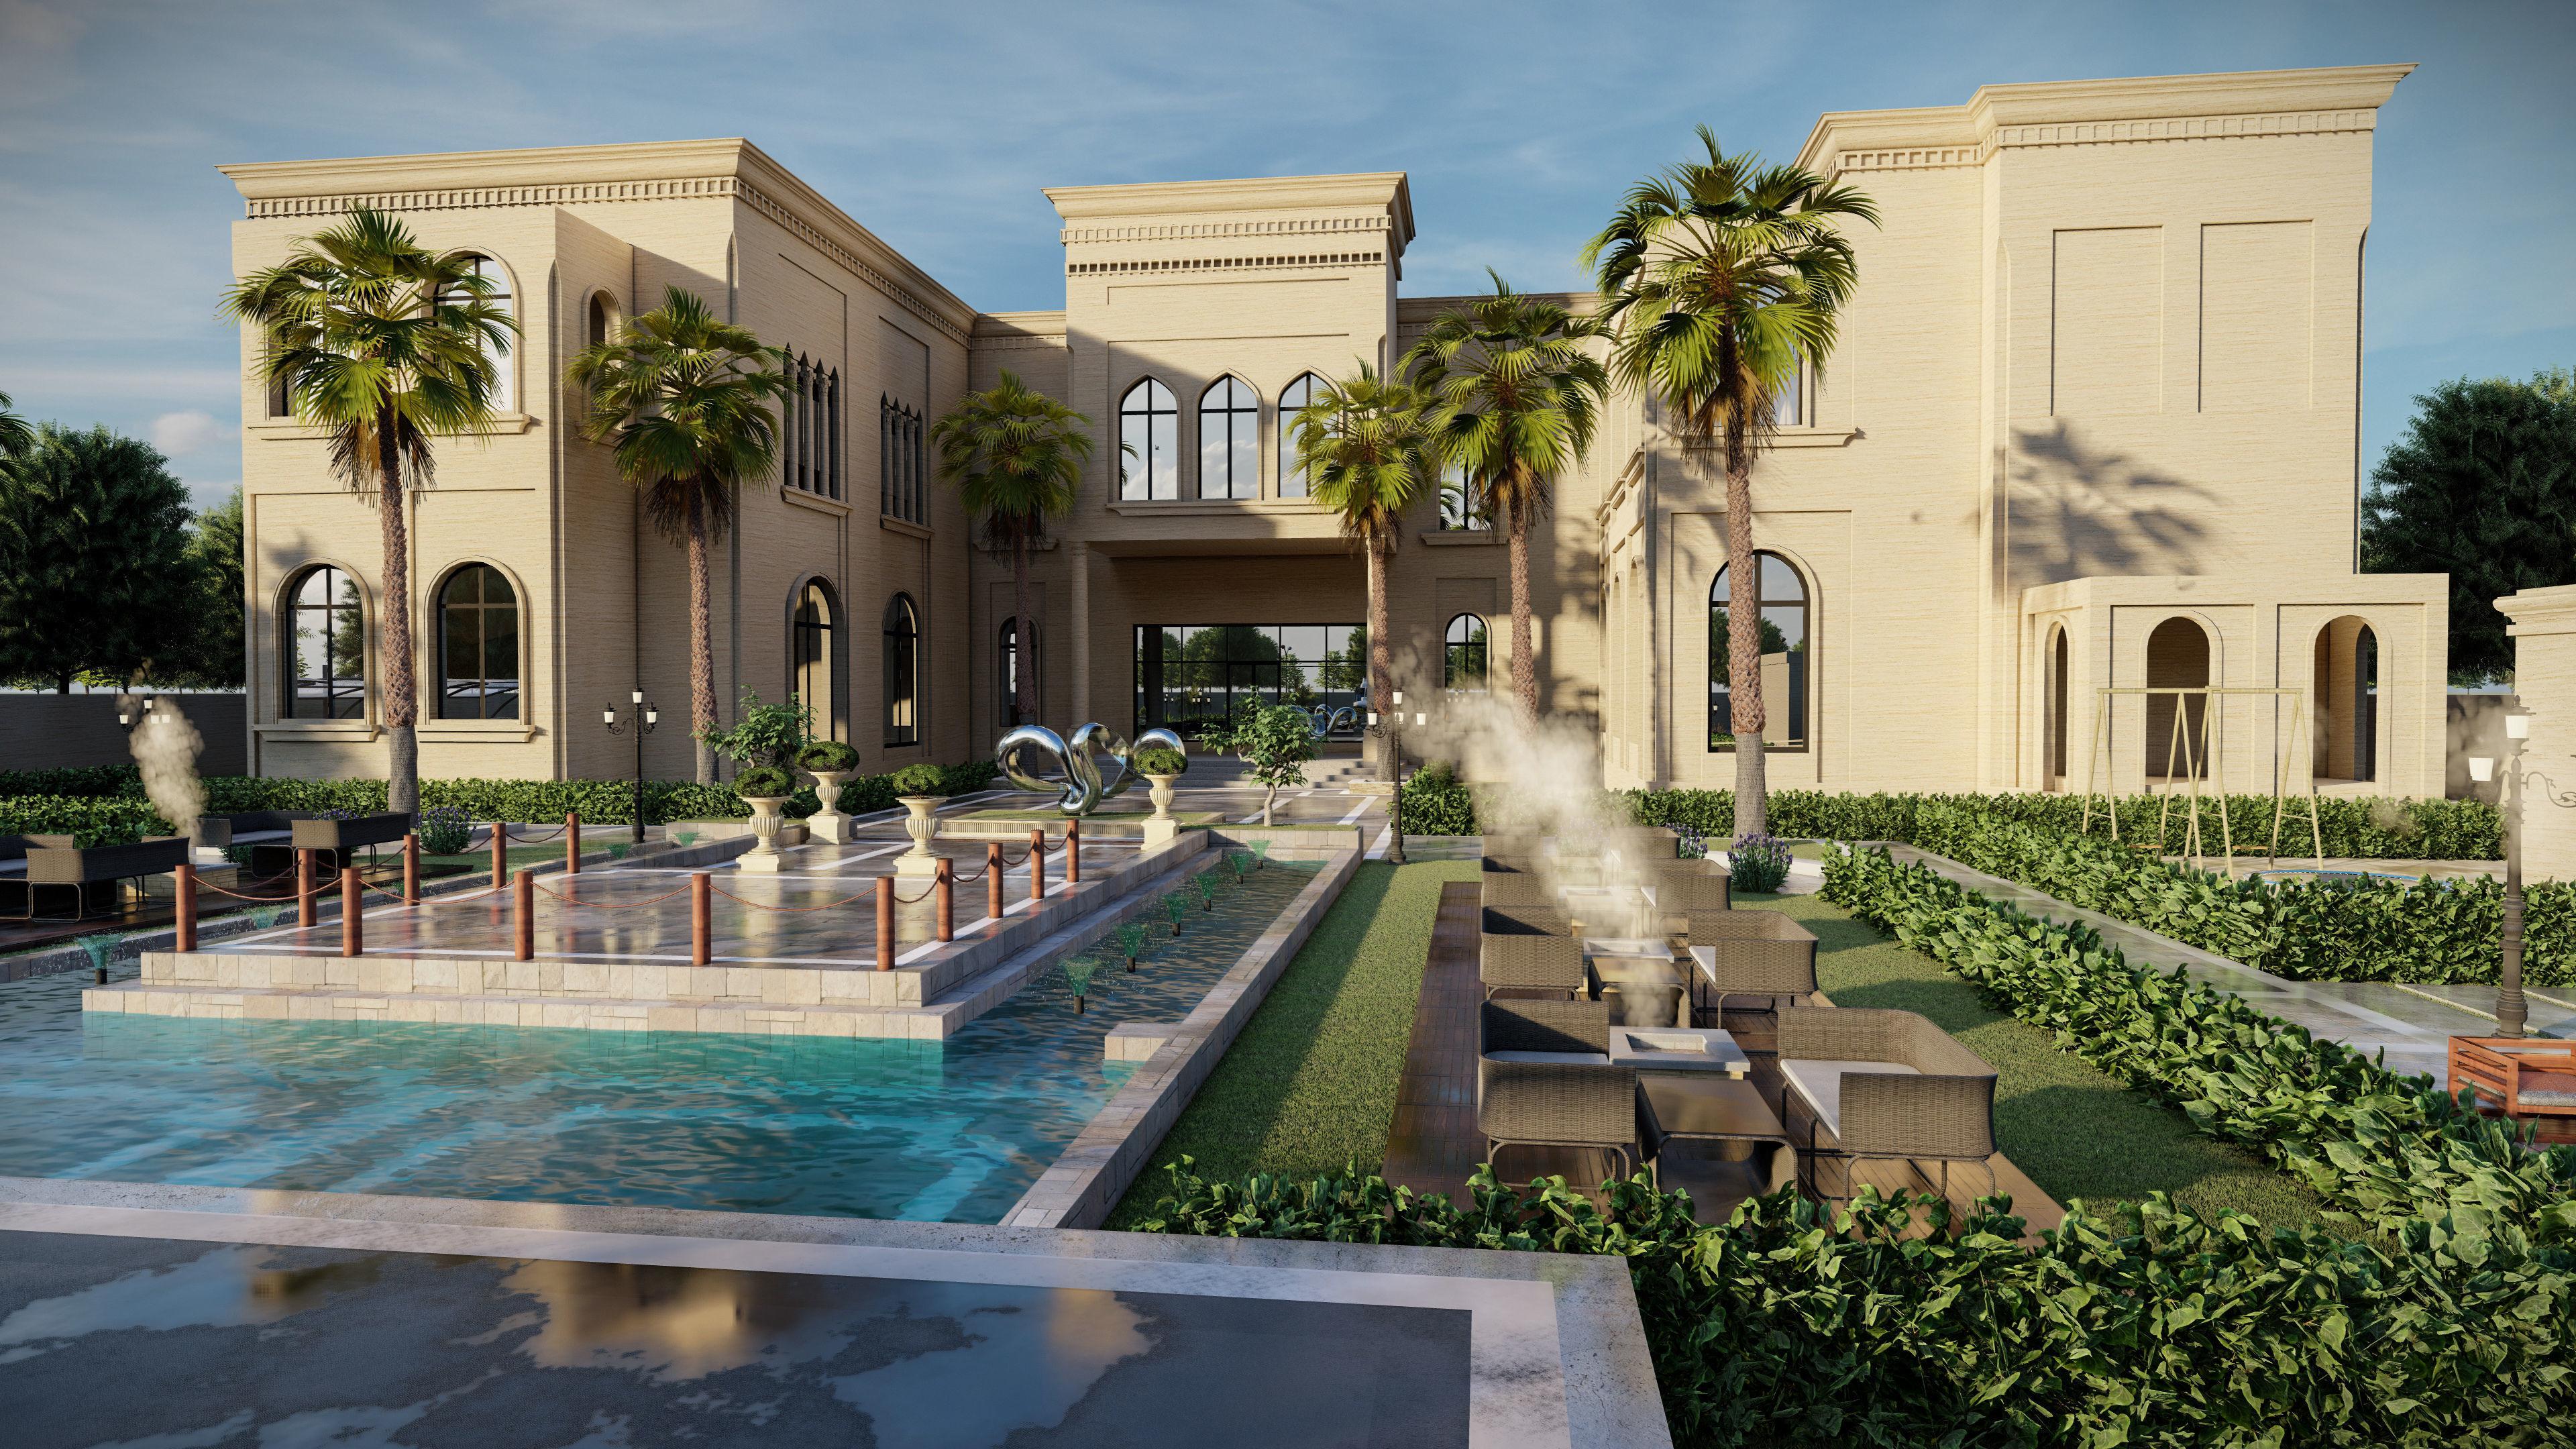 Big luxury backyard design sketchup model with lumion 1 on Sketchup Backyard id=63437